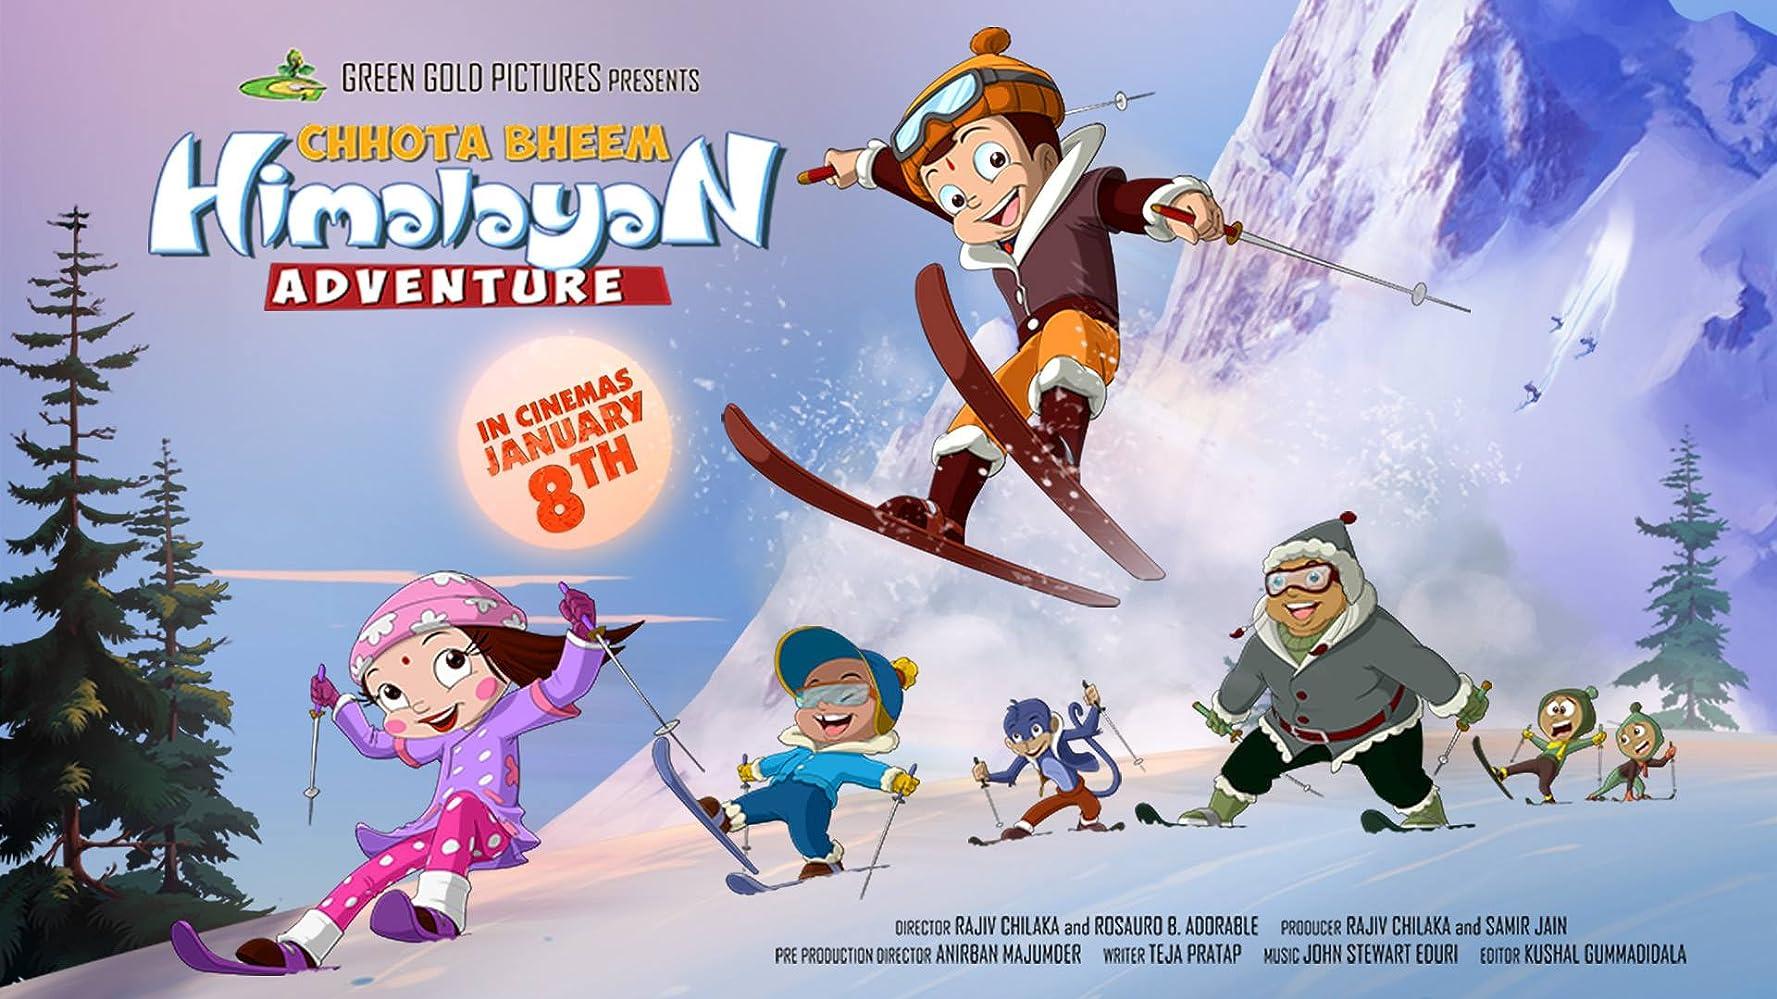 Chhota Bheem Himalayan Adventure 2016 Hindi Movie WebRip 300mb 480p 700mb 720p 2GB 1080p